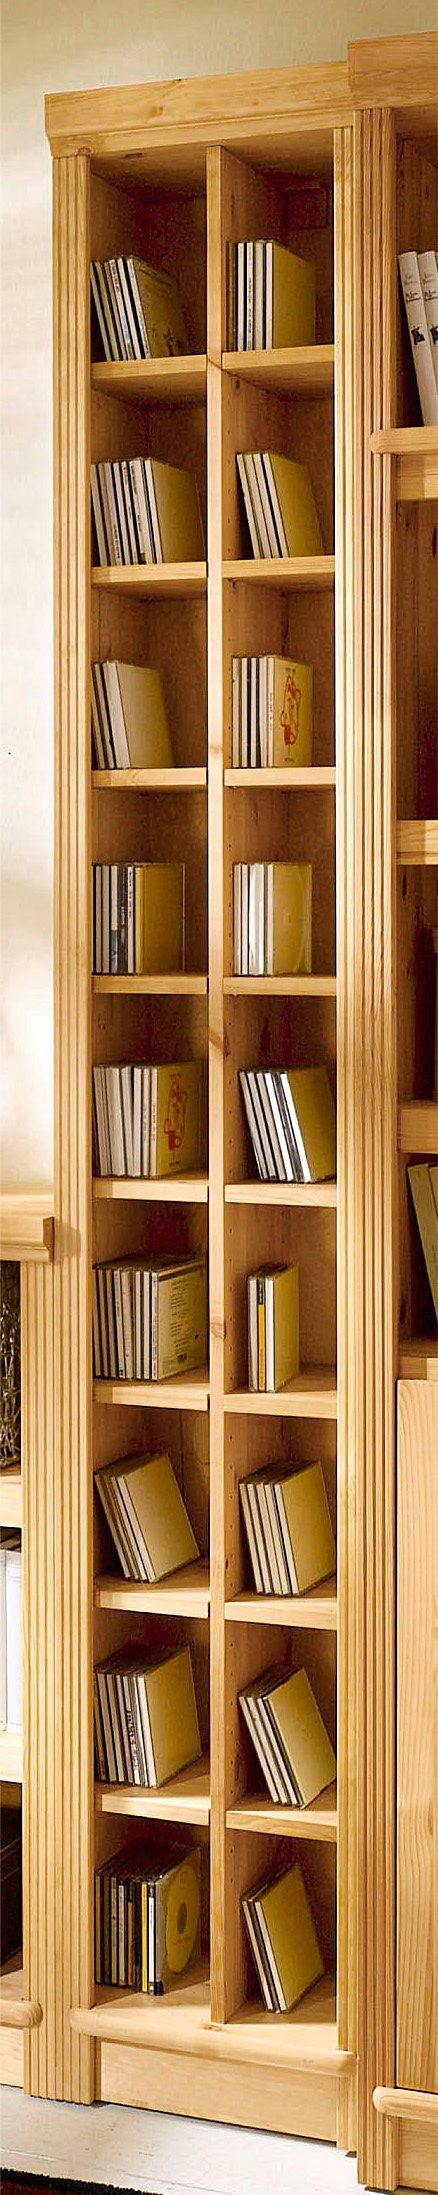 CD-Regal »Serie Soeren«, in 2 Höhen | Wohnzimmer > TV-HiFi-Möbel > CD- & DVD-Regale | Weiß | Massivholz - Kiefer - Gebeizt - Poliert | SERIE SOEREN